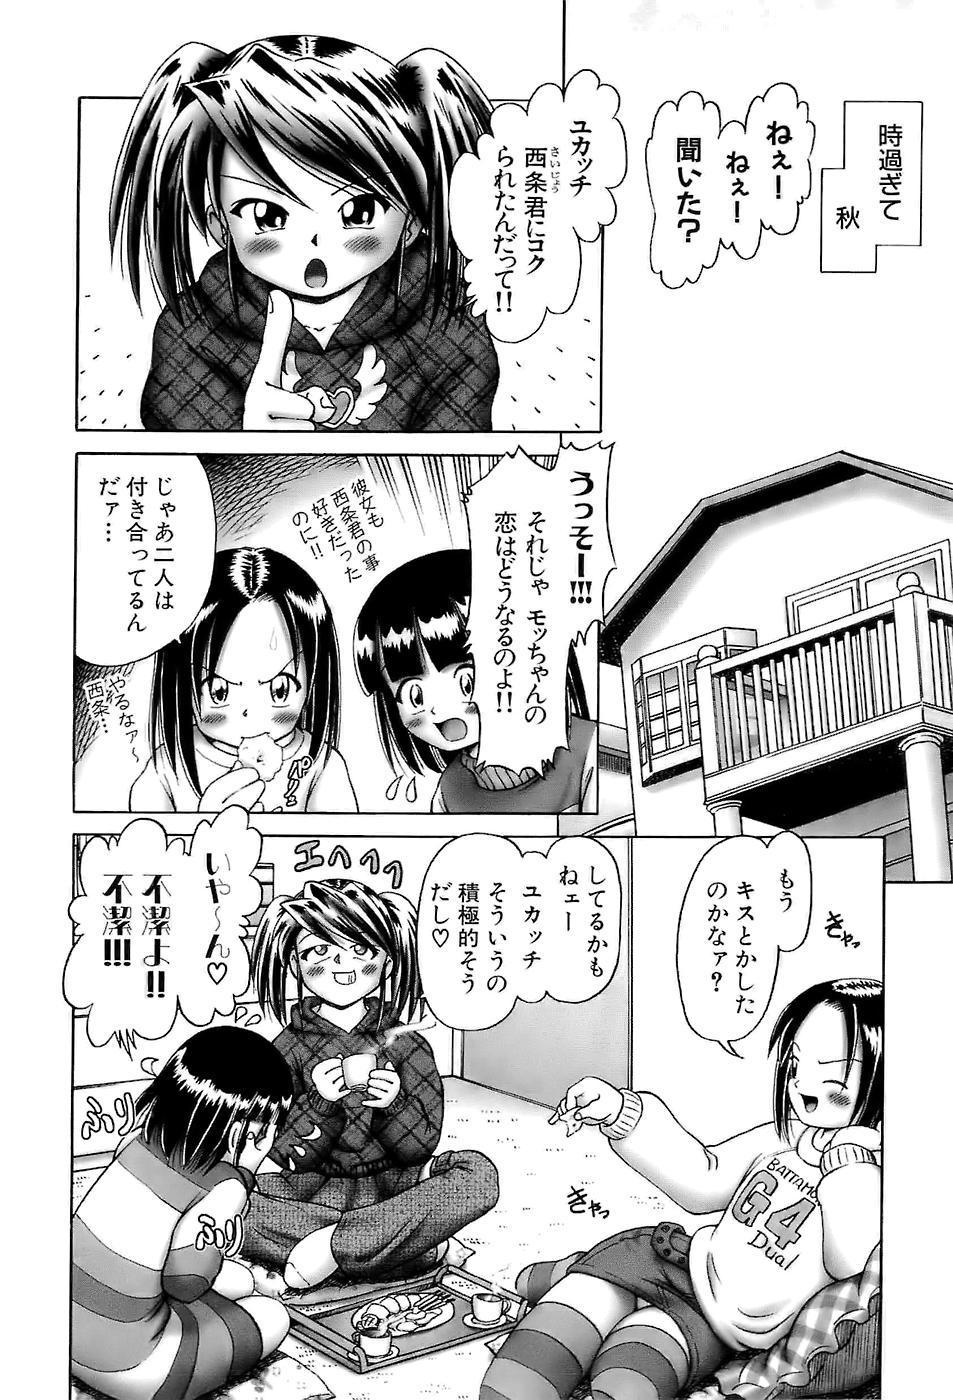 [Bow Rei] Osanai Kajitsu -Inkou Shougakusei no Houkago- Jou 77